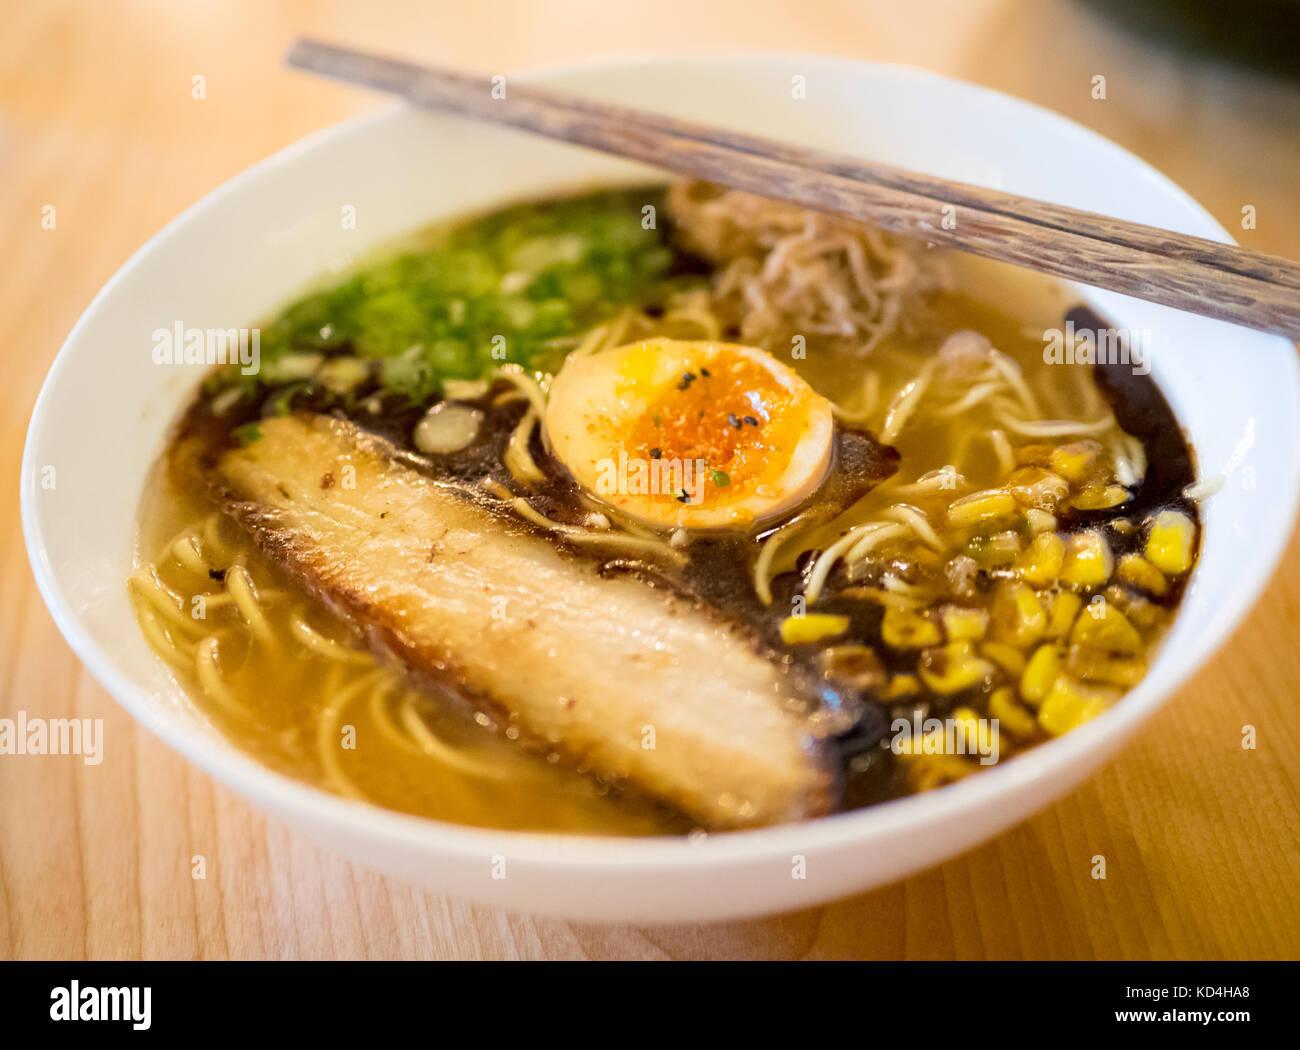 Japanese ramen noodles (prairie pork shio) from the Prairie Noodle Shop in Edmonton, Alberta, Canada. - Stock Image